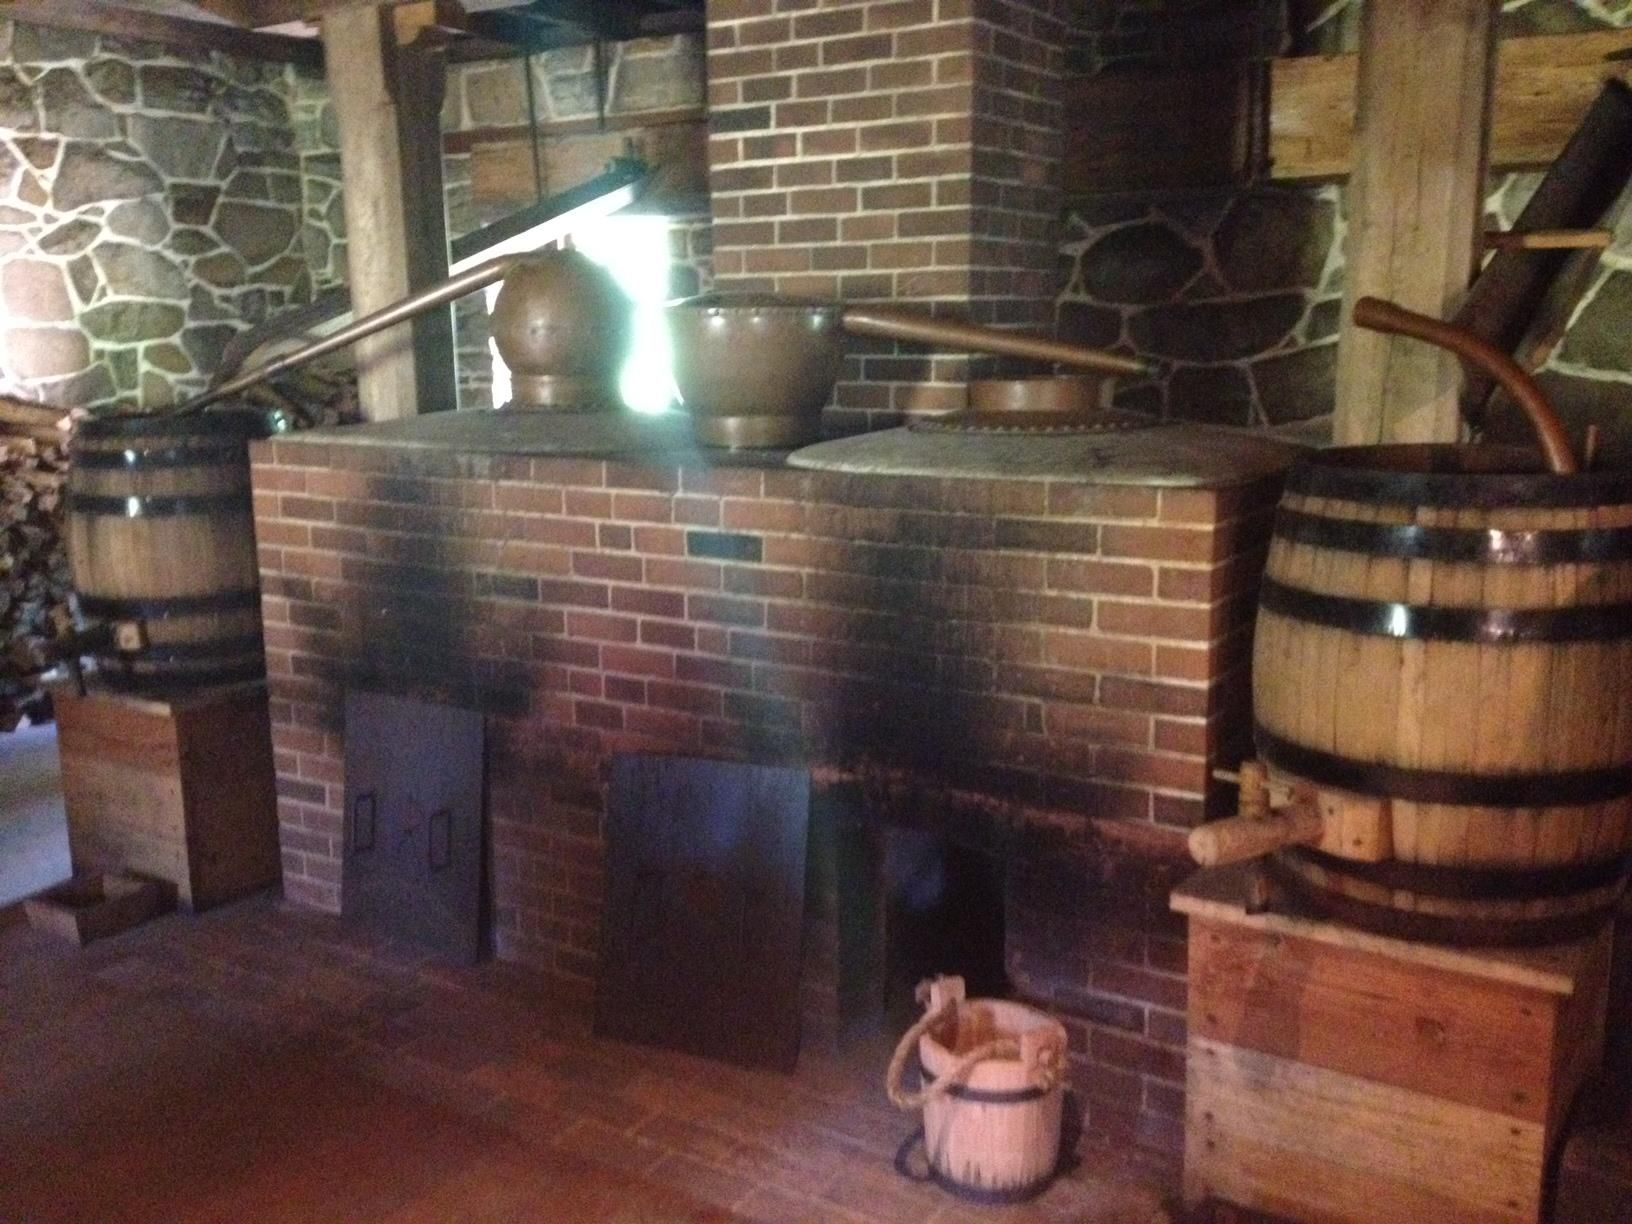 george washington was making moonshine using a rye corn malted